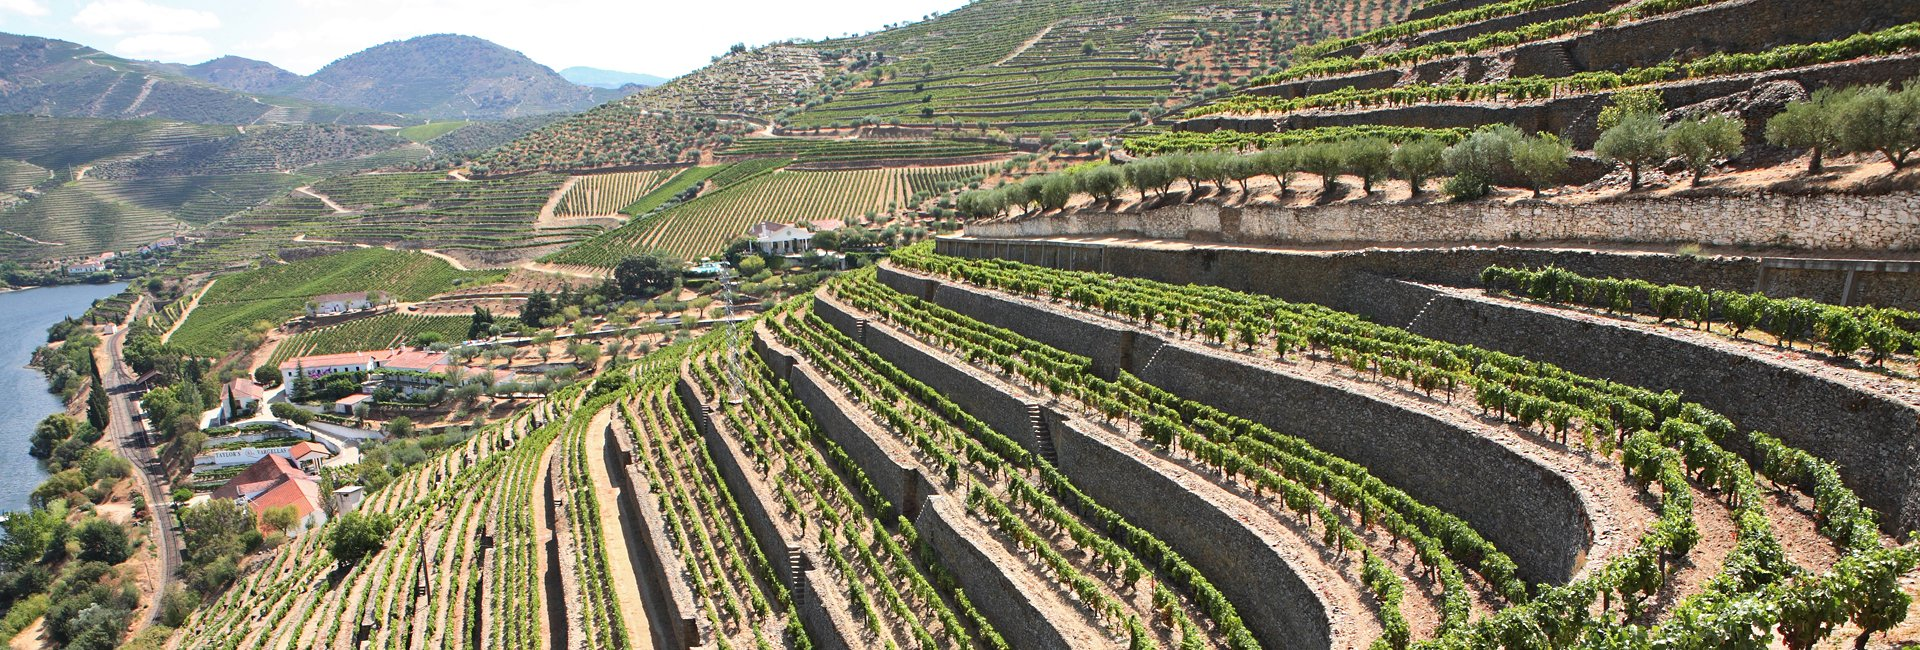 72 Viticultores Associados